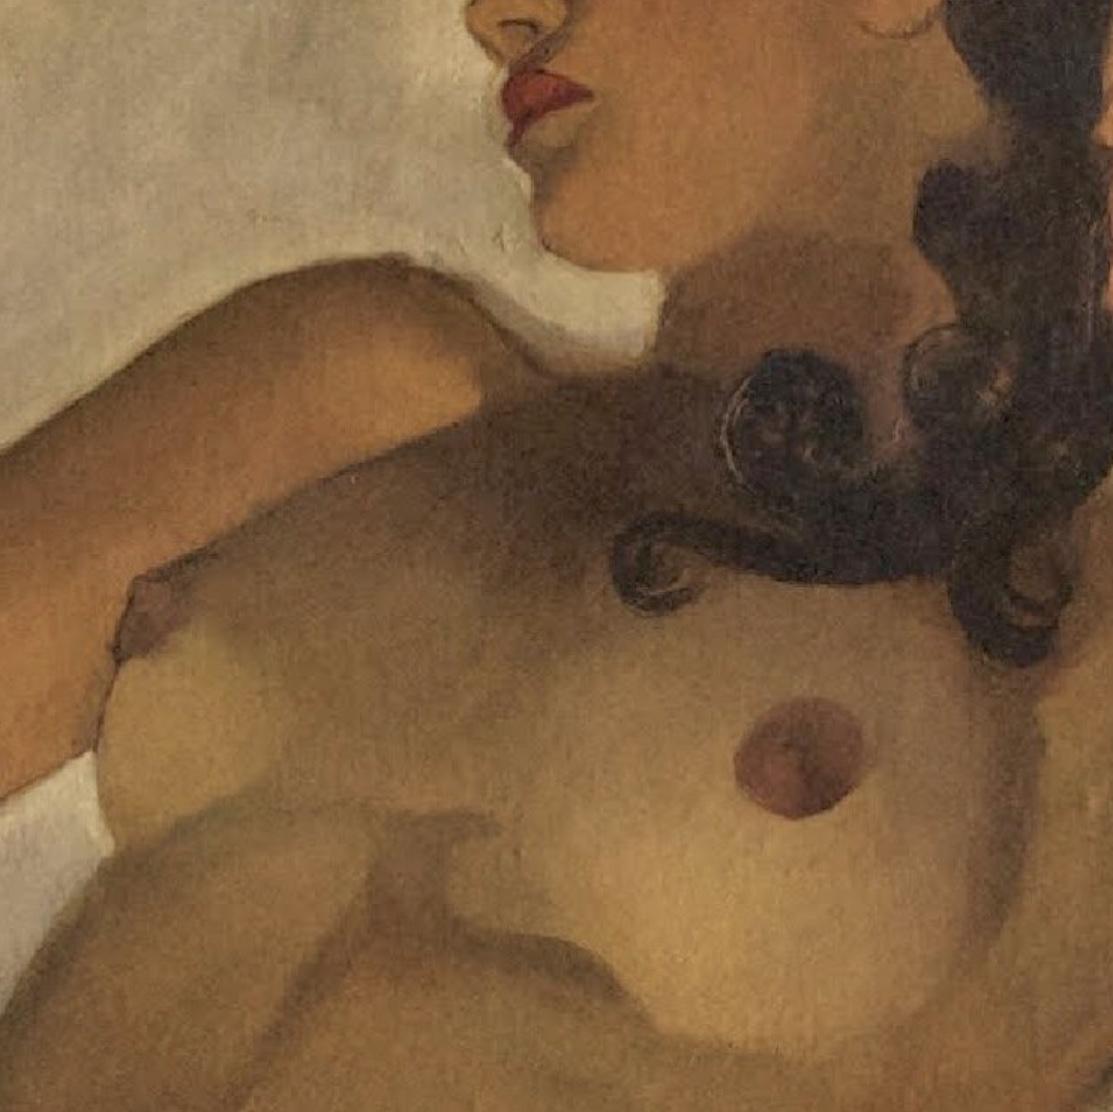 female-power-divine-feminine-pleasure-nude.jpg